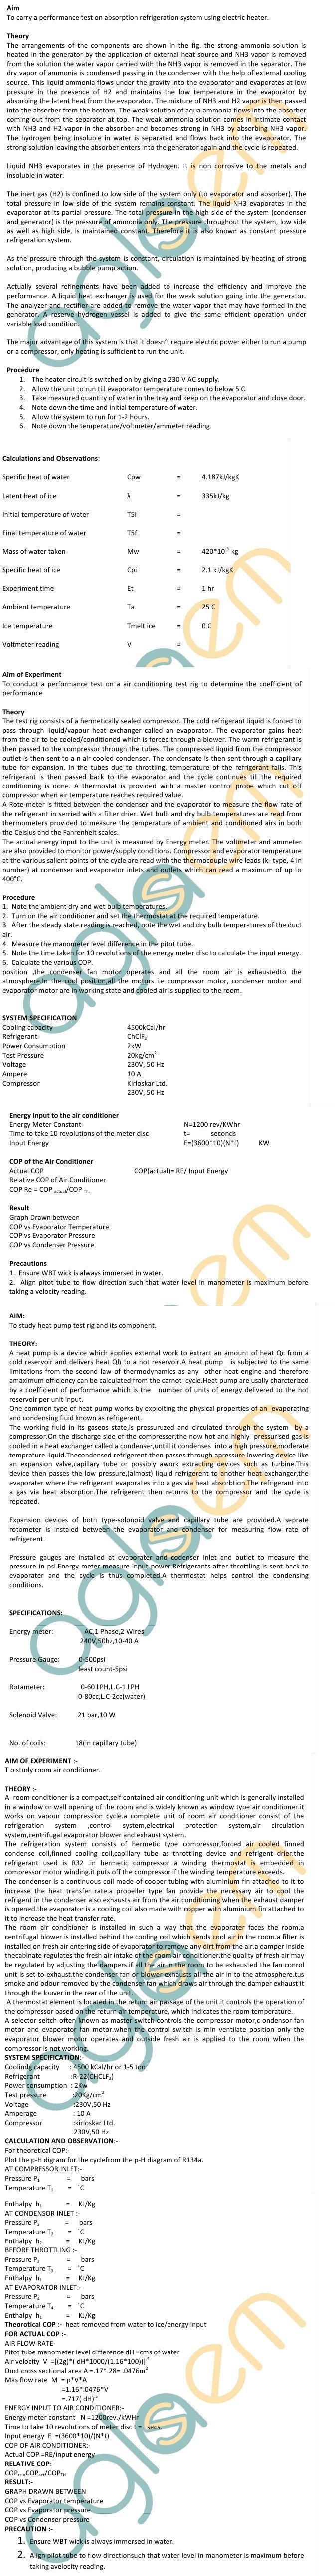 DTU Practical Files - 6 Sem - Mass Transfer Lab